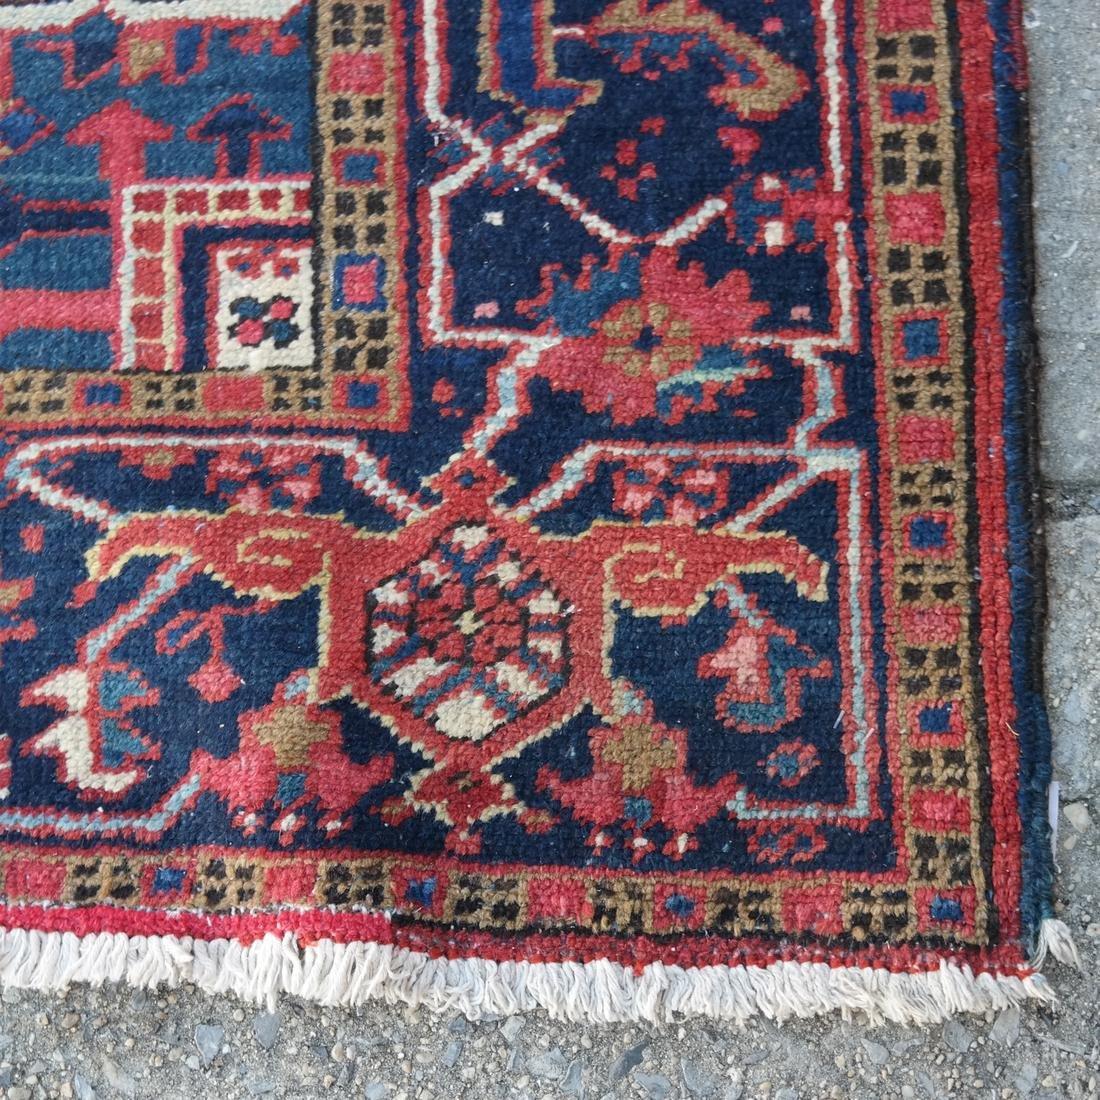 Antique Iranian Heriz Carpet, 9 x 12 - 2